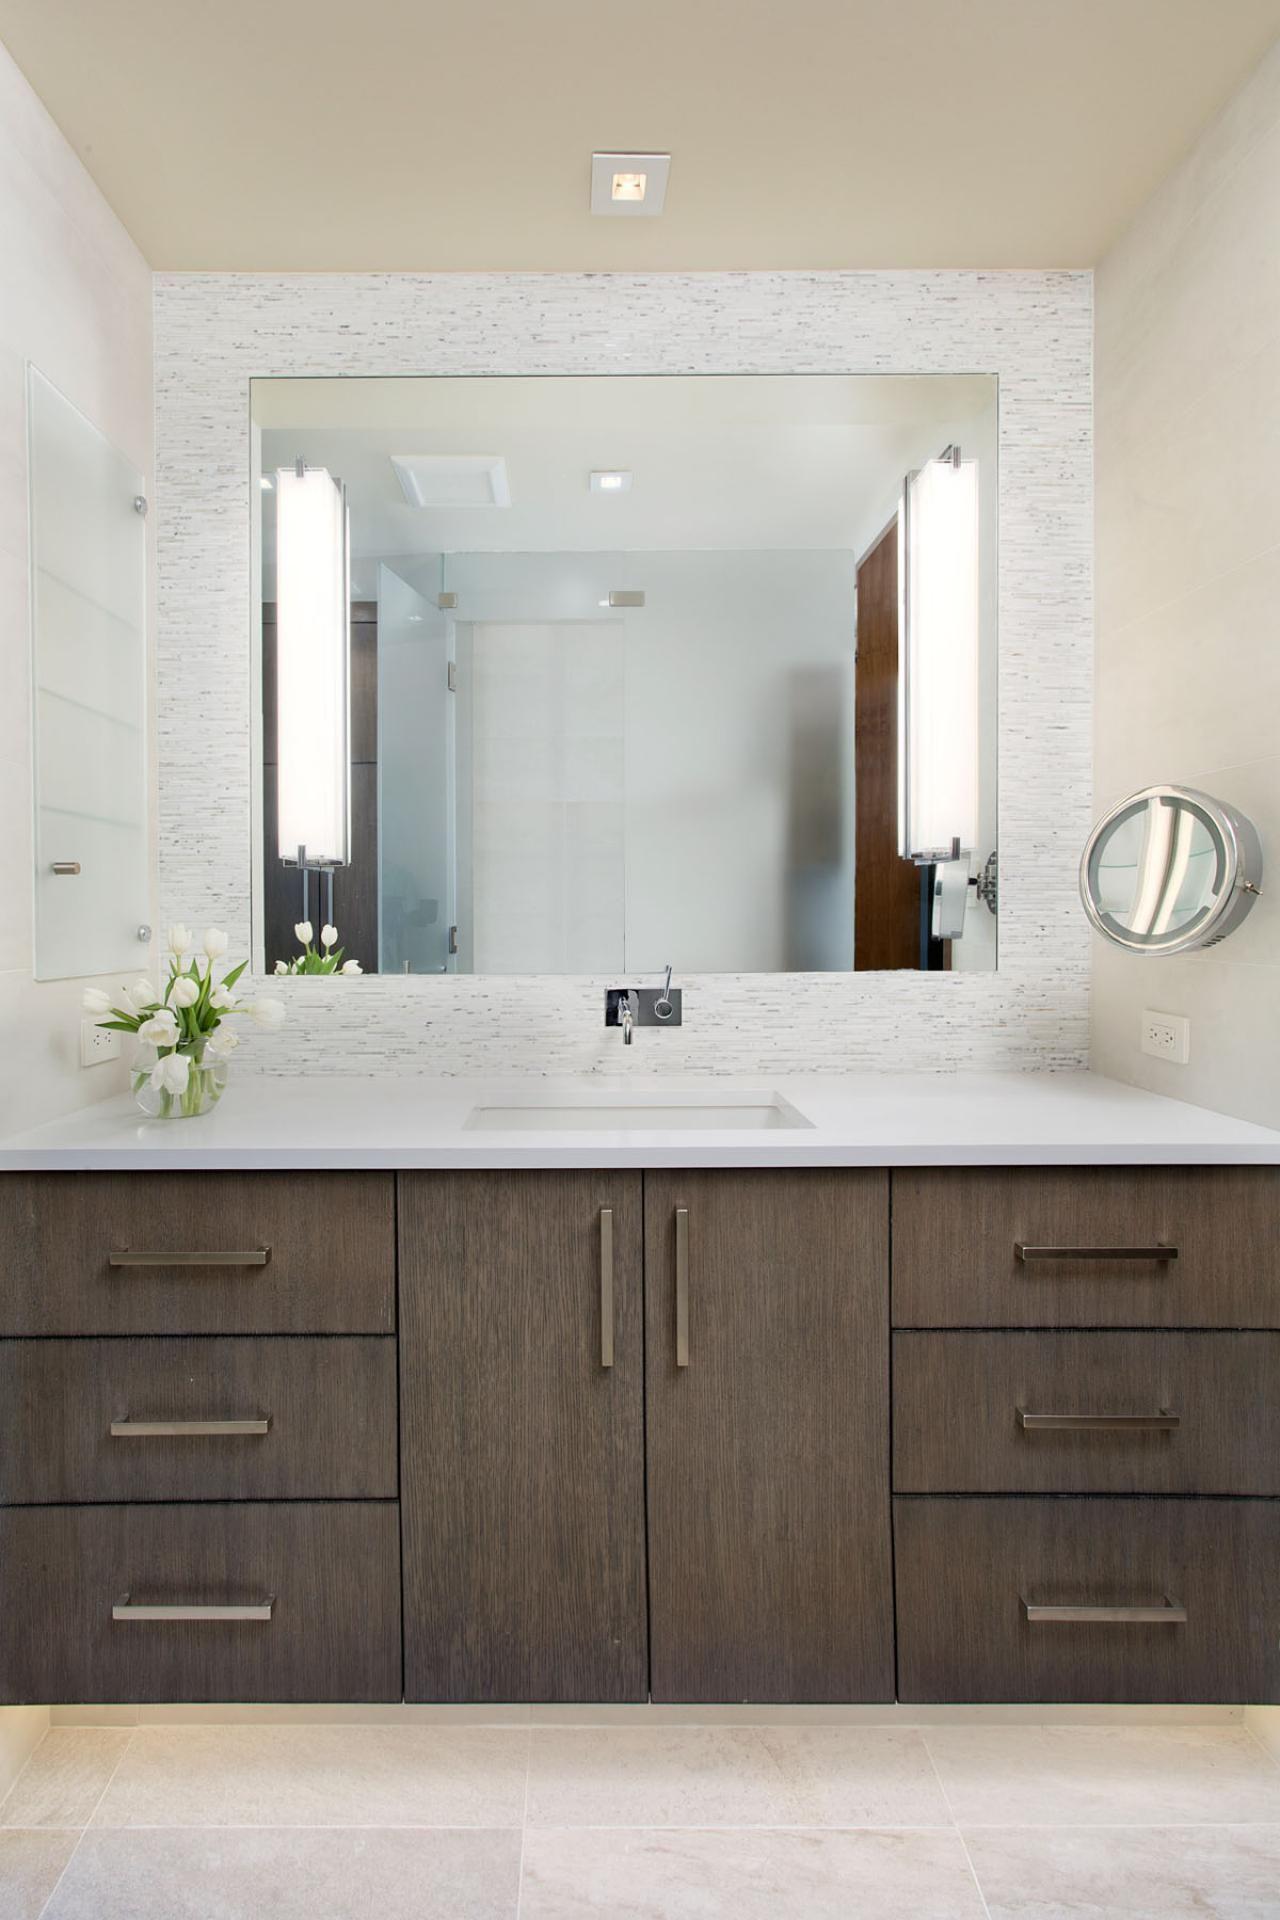 Gather pink bathroom decor ideas and get